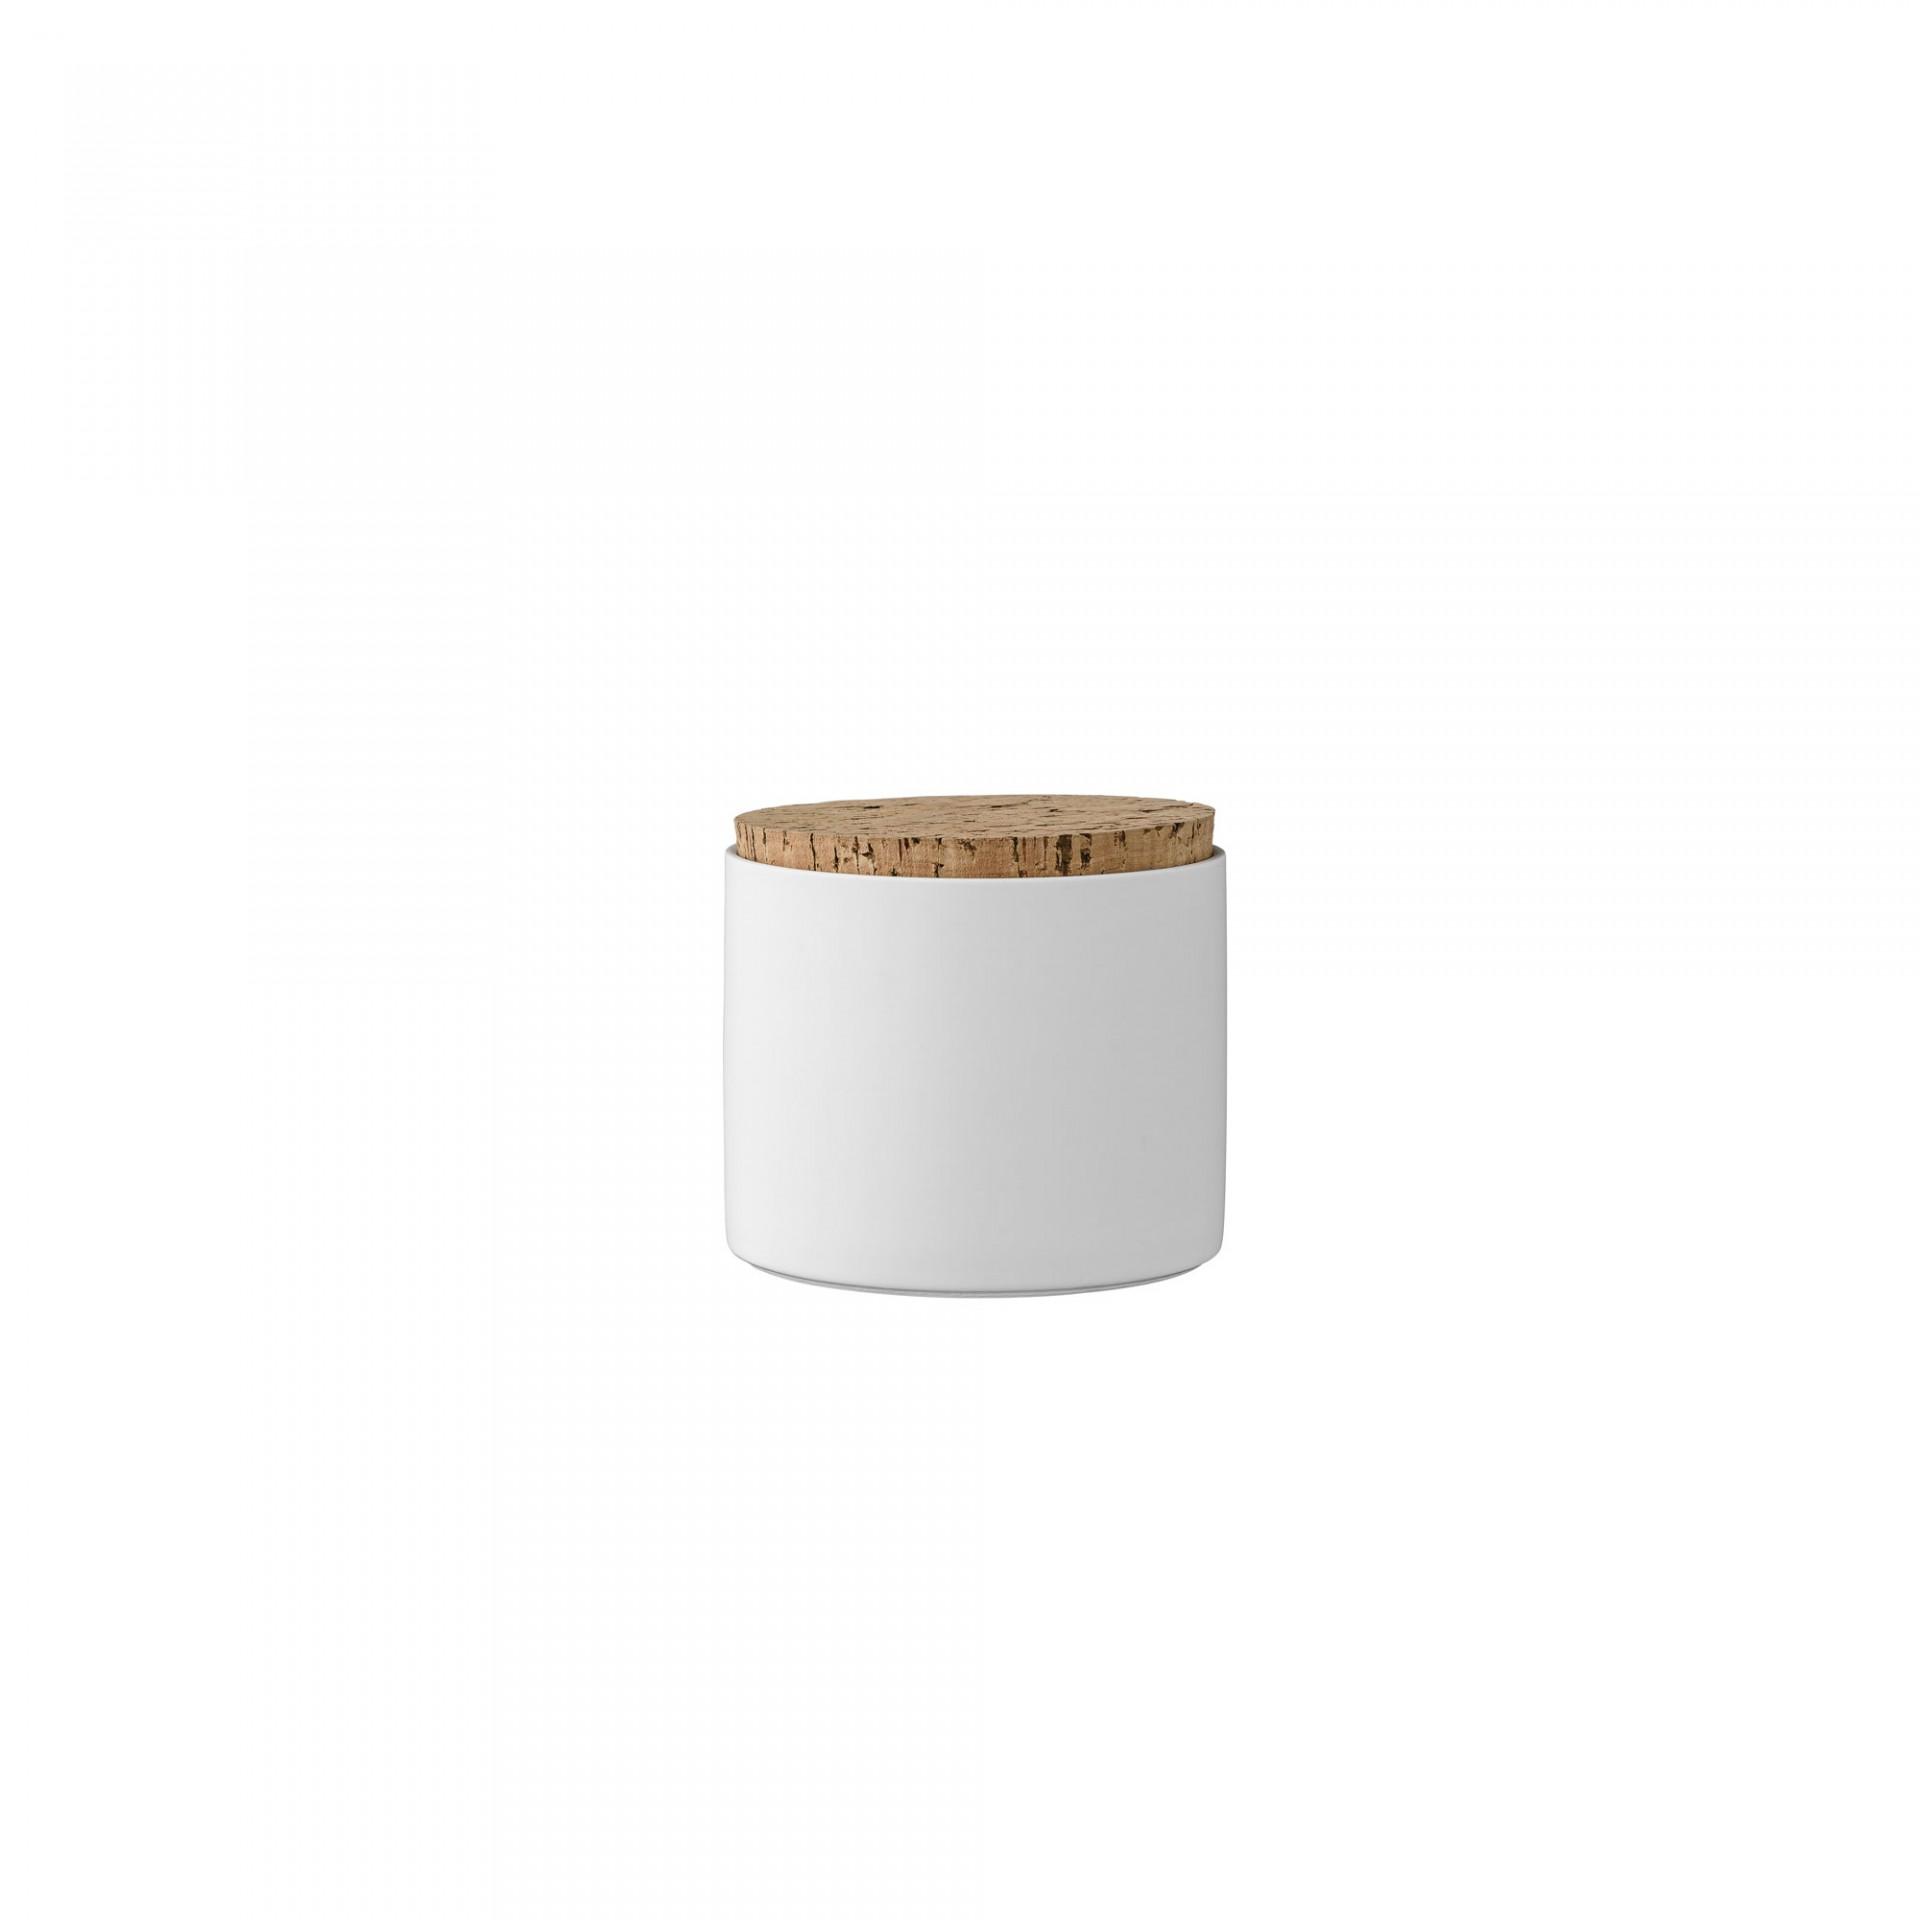 Pote em porcelana c/tampa cortiça, Ø11x12 cm